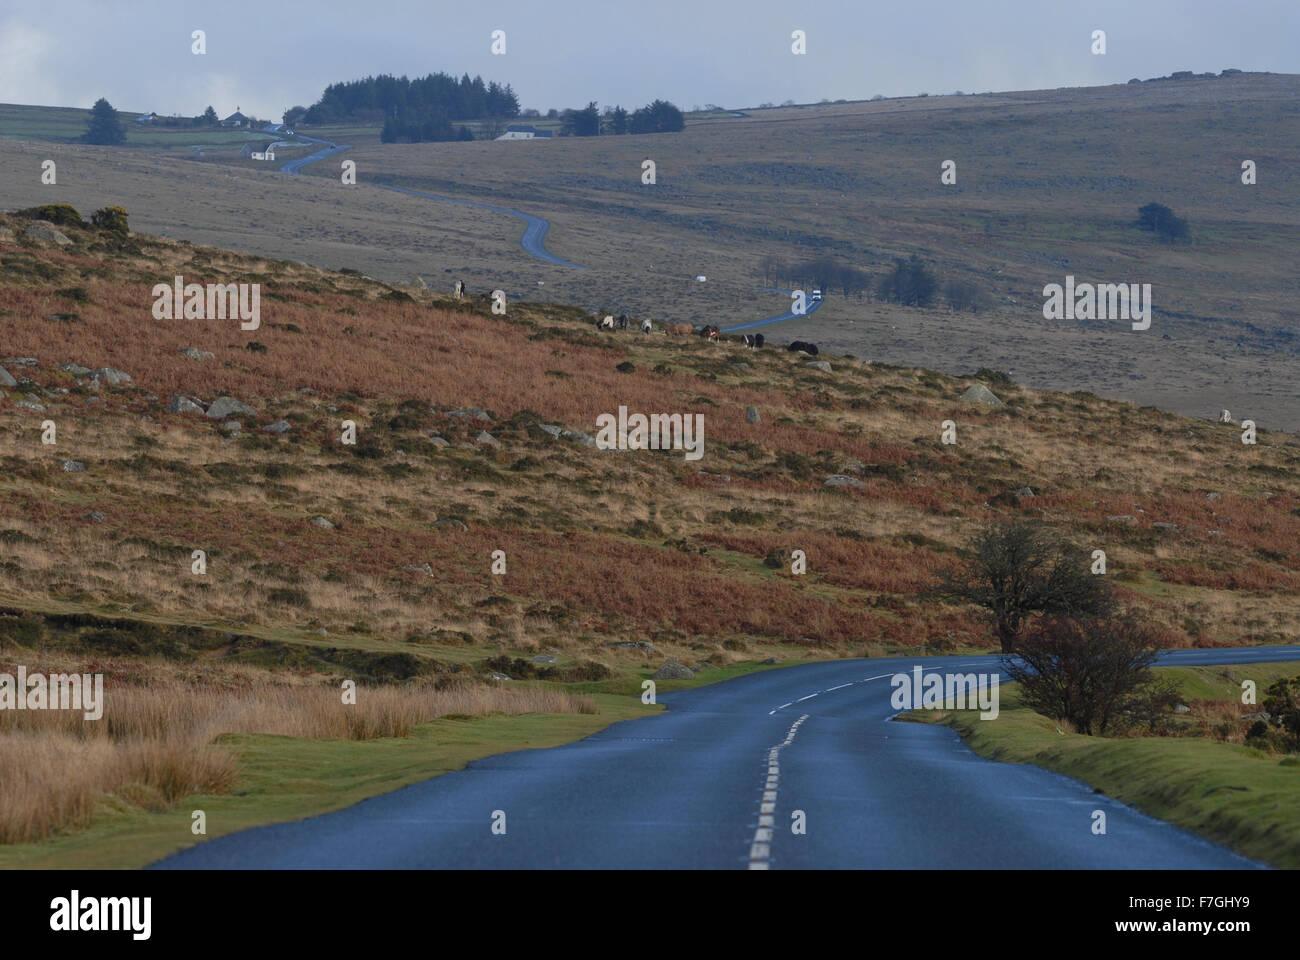 Road through Dartmoor National Park in the winter, Devon, England - Stock Image